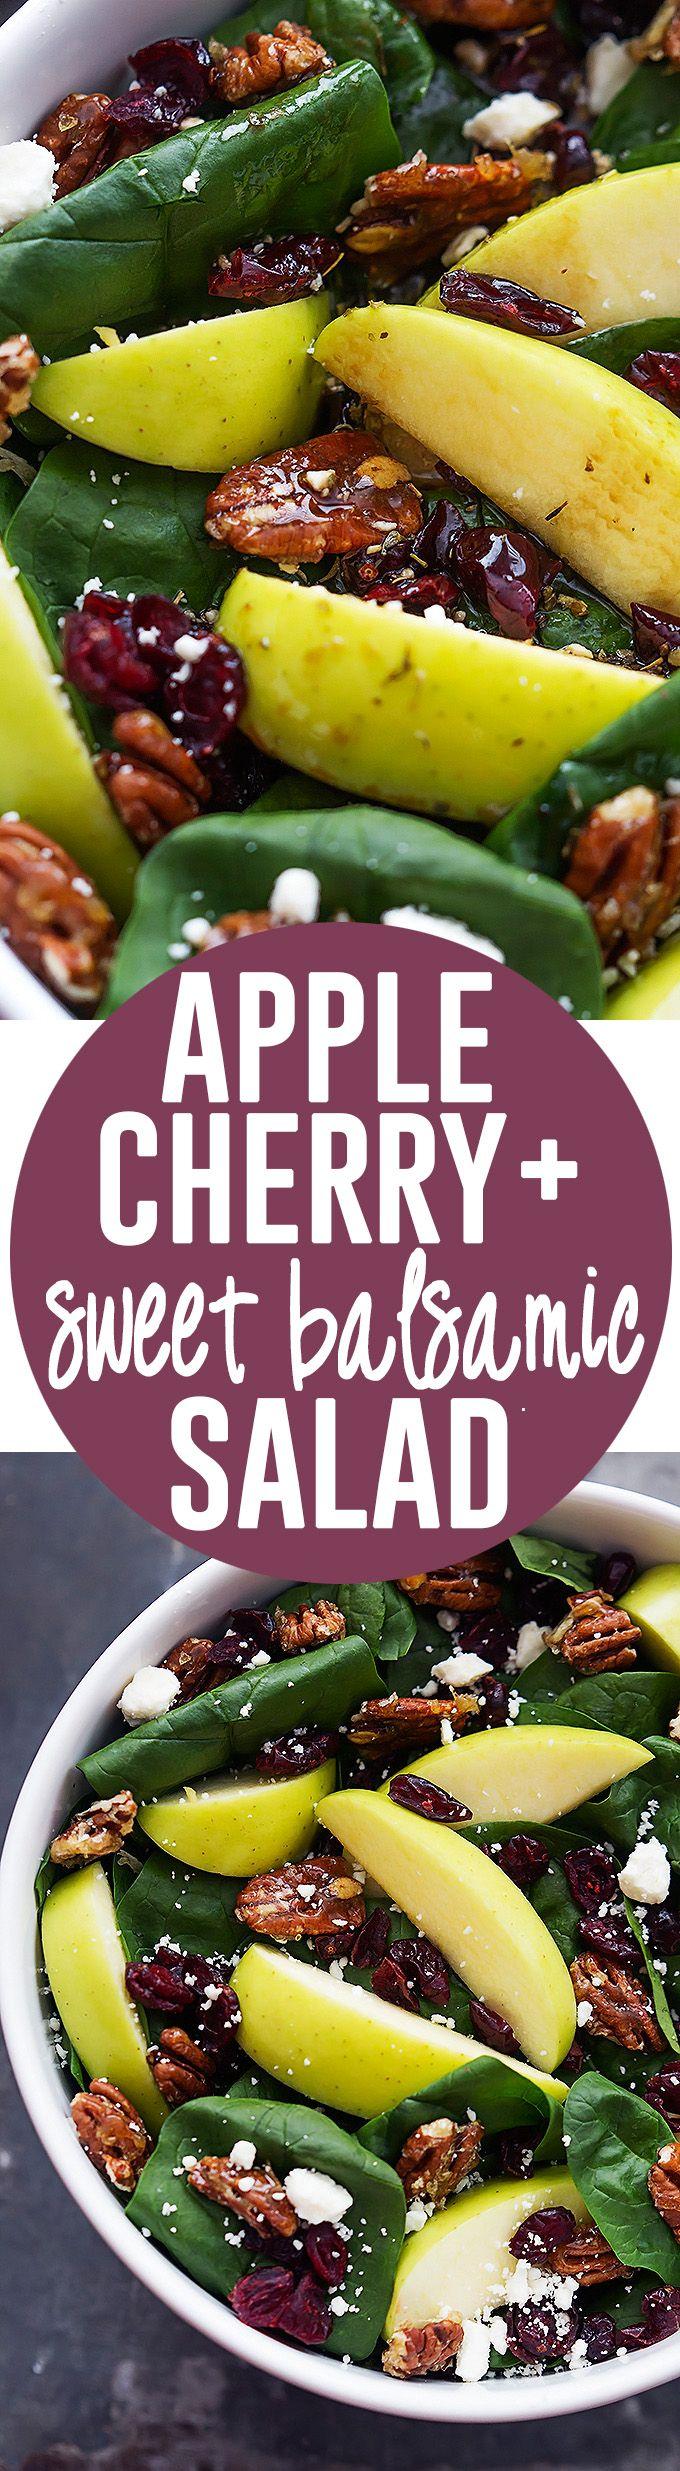 Apple Cherry Candied Pecan Salad with Sweet Balsamic Dressing   Creme de la Crumb